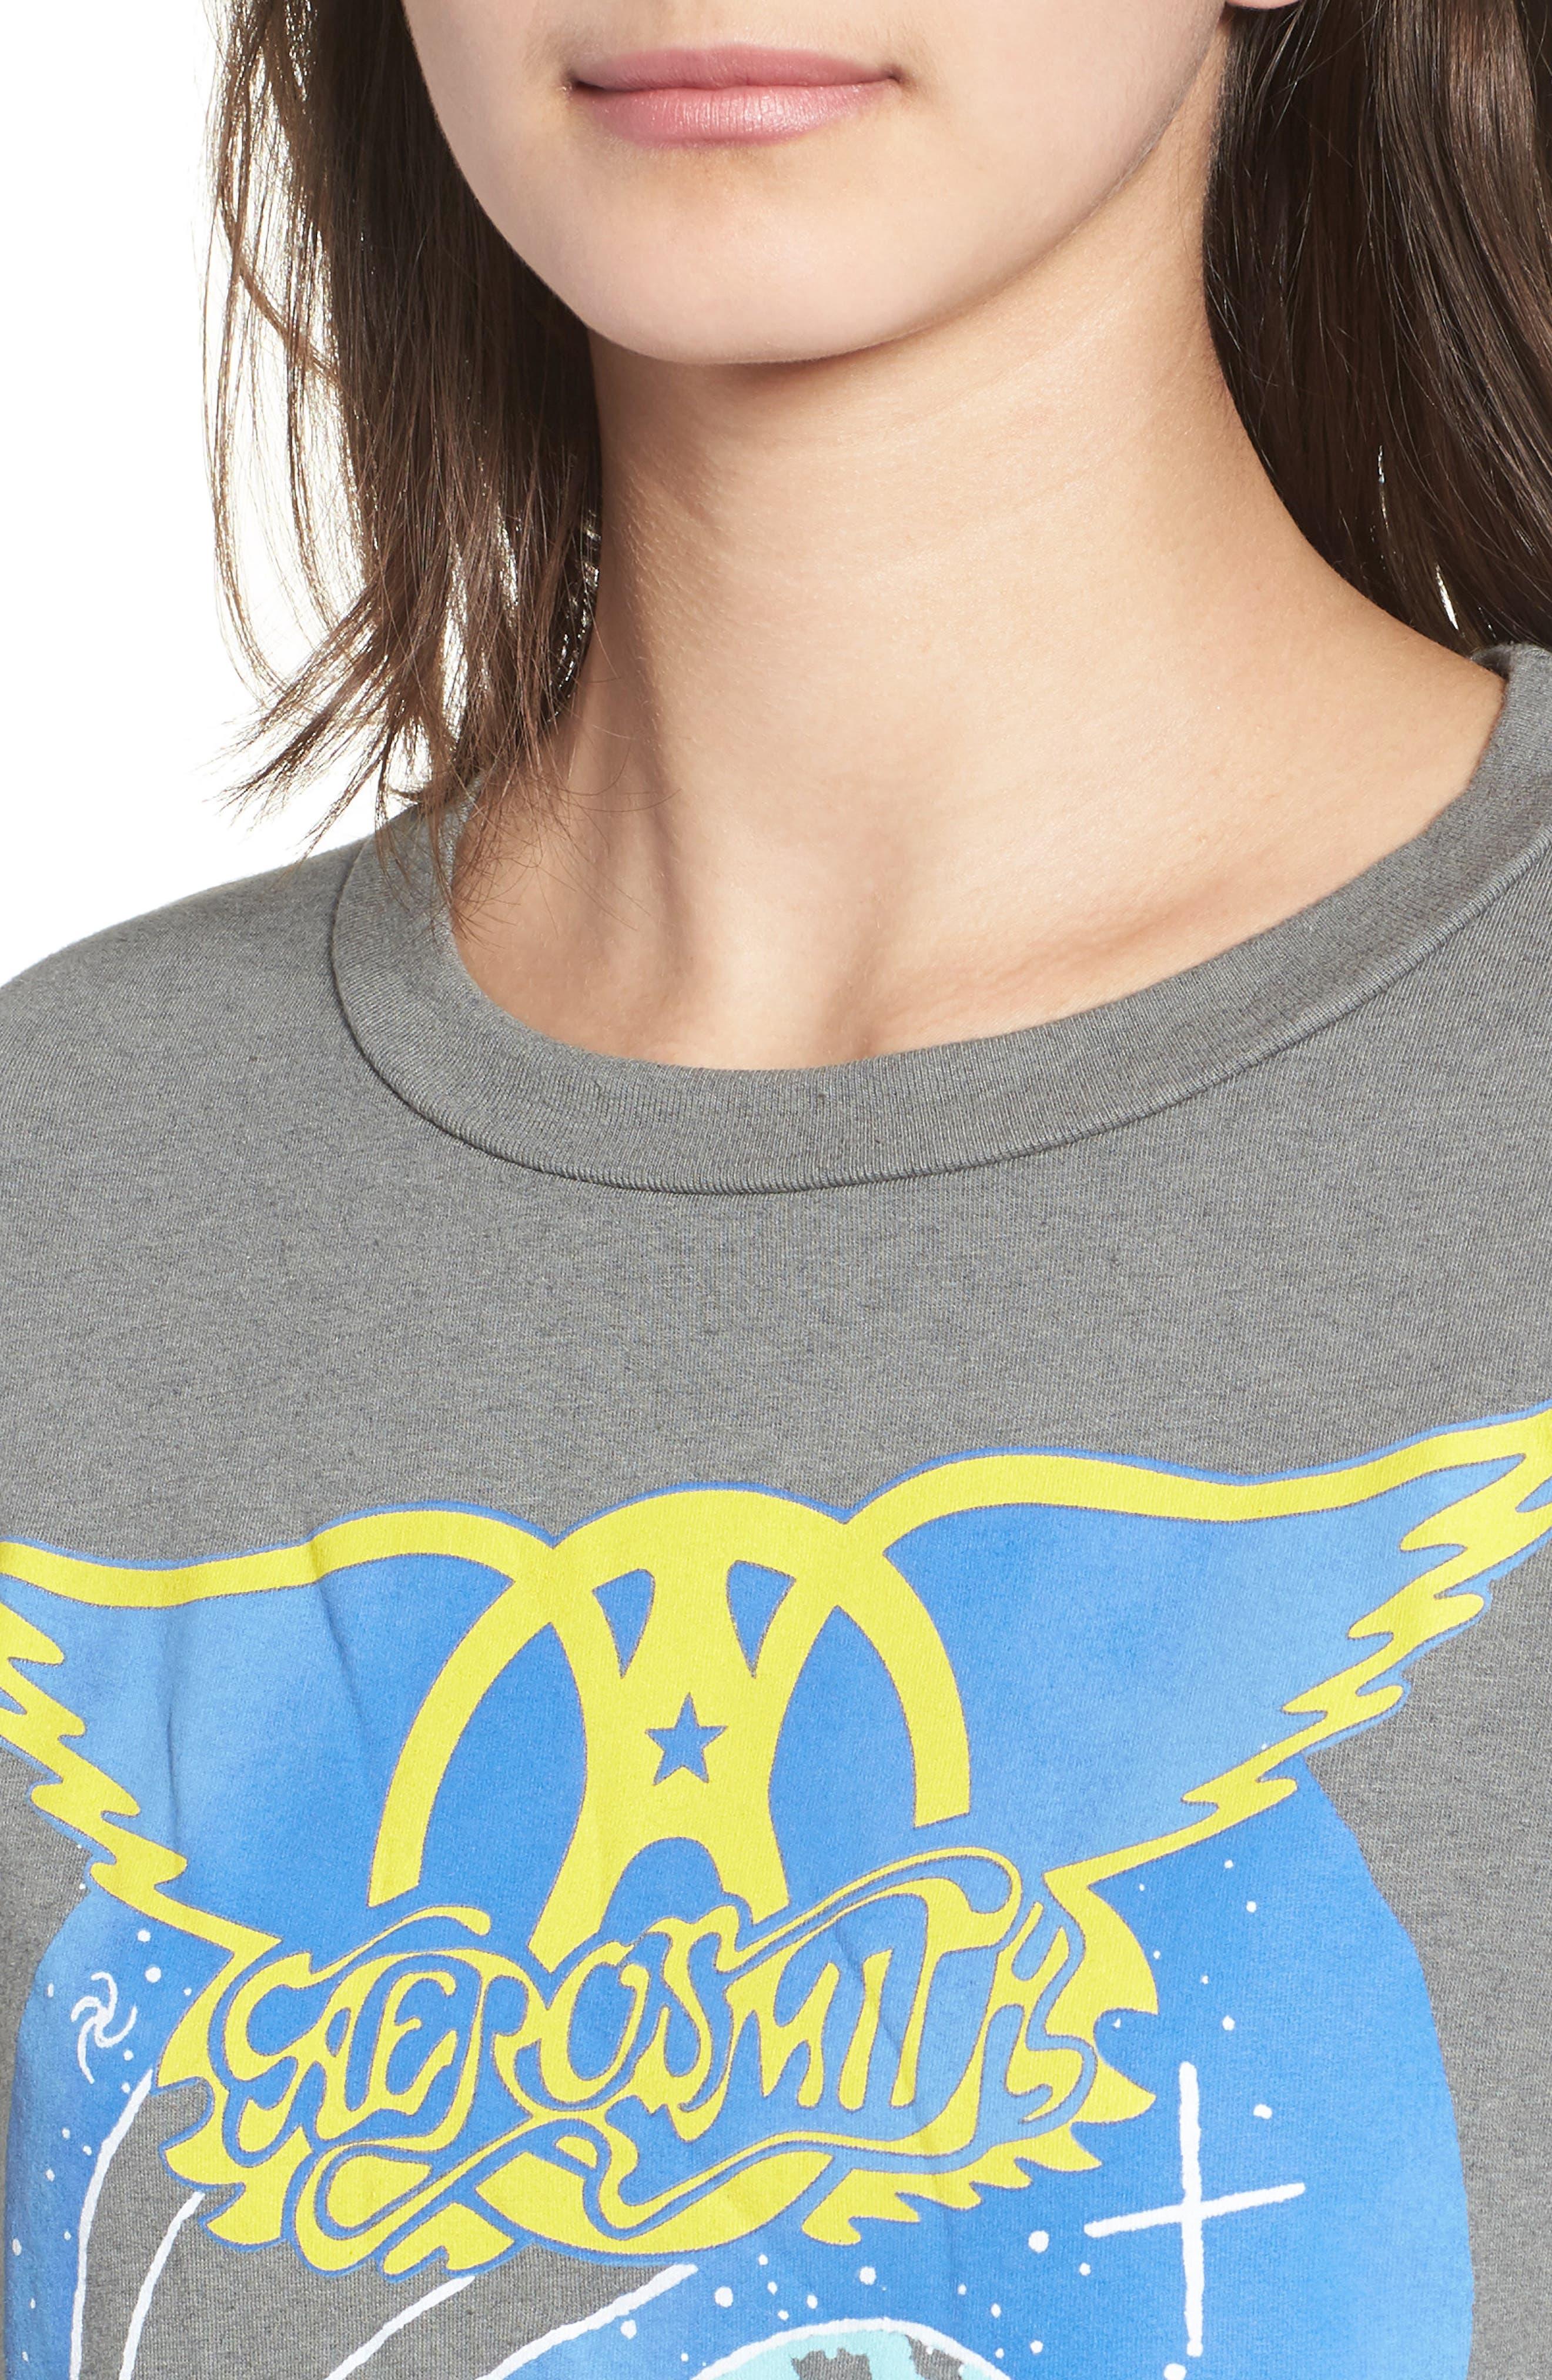 Aerosmith Sweatshirt,                             Alternate thumbnail 4, color,                             Clay